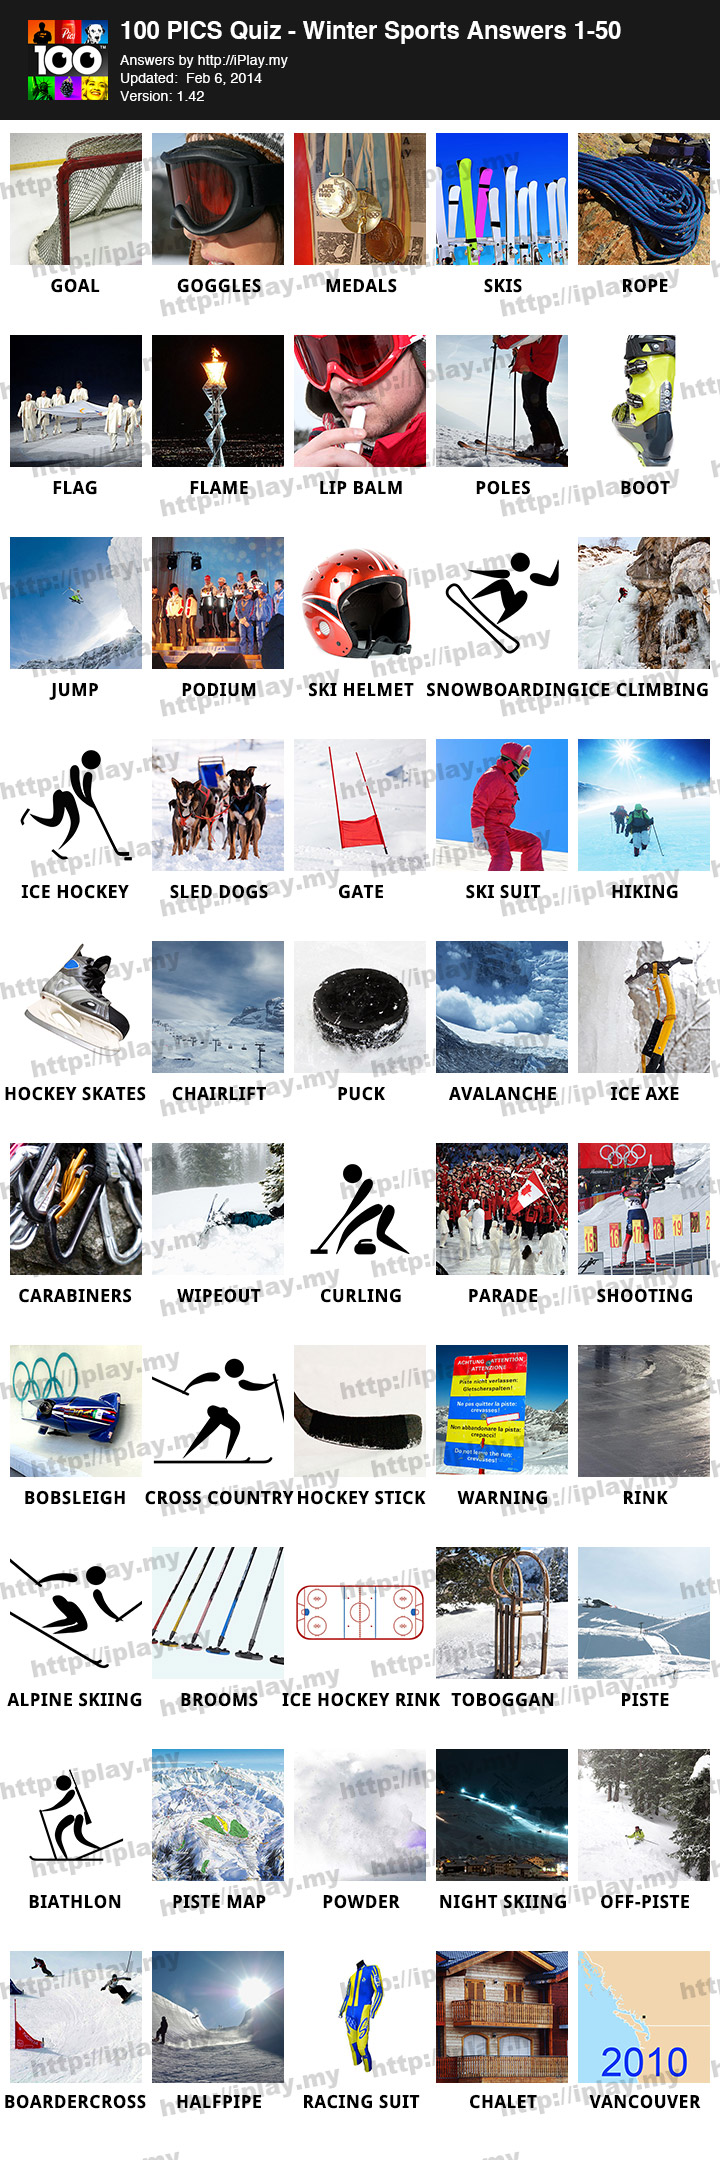 100-Pics-Quiz-Winter-Sports-Answers-1-50